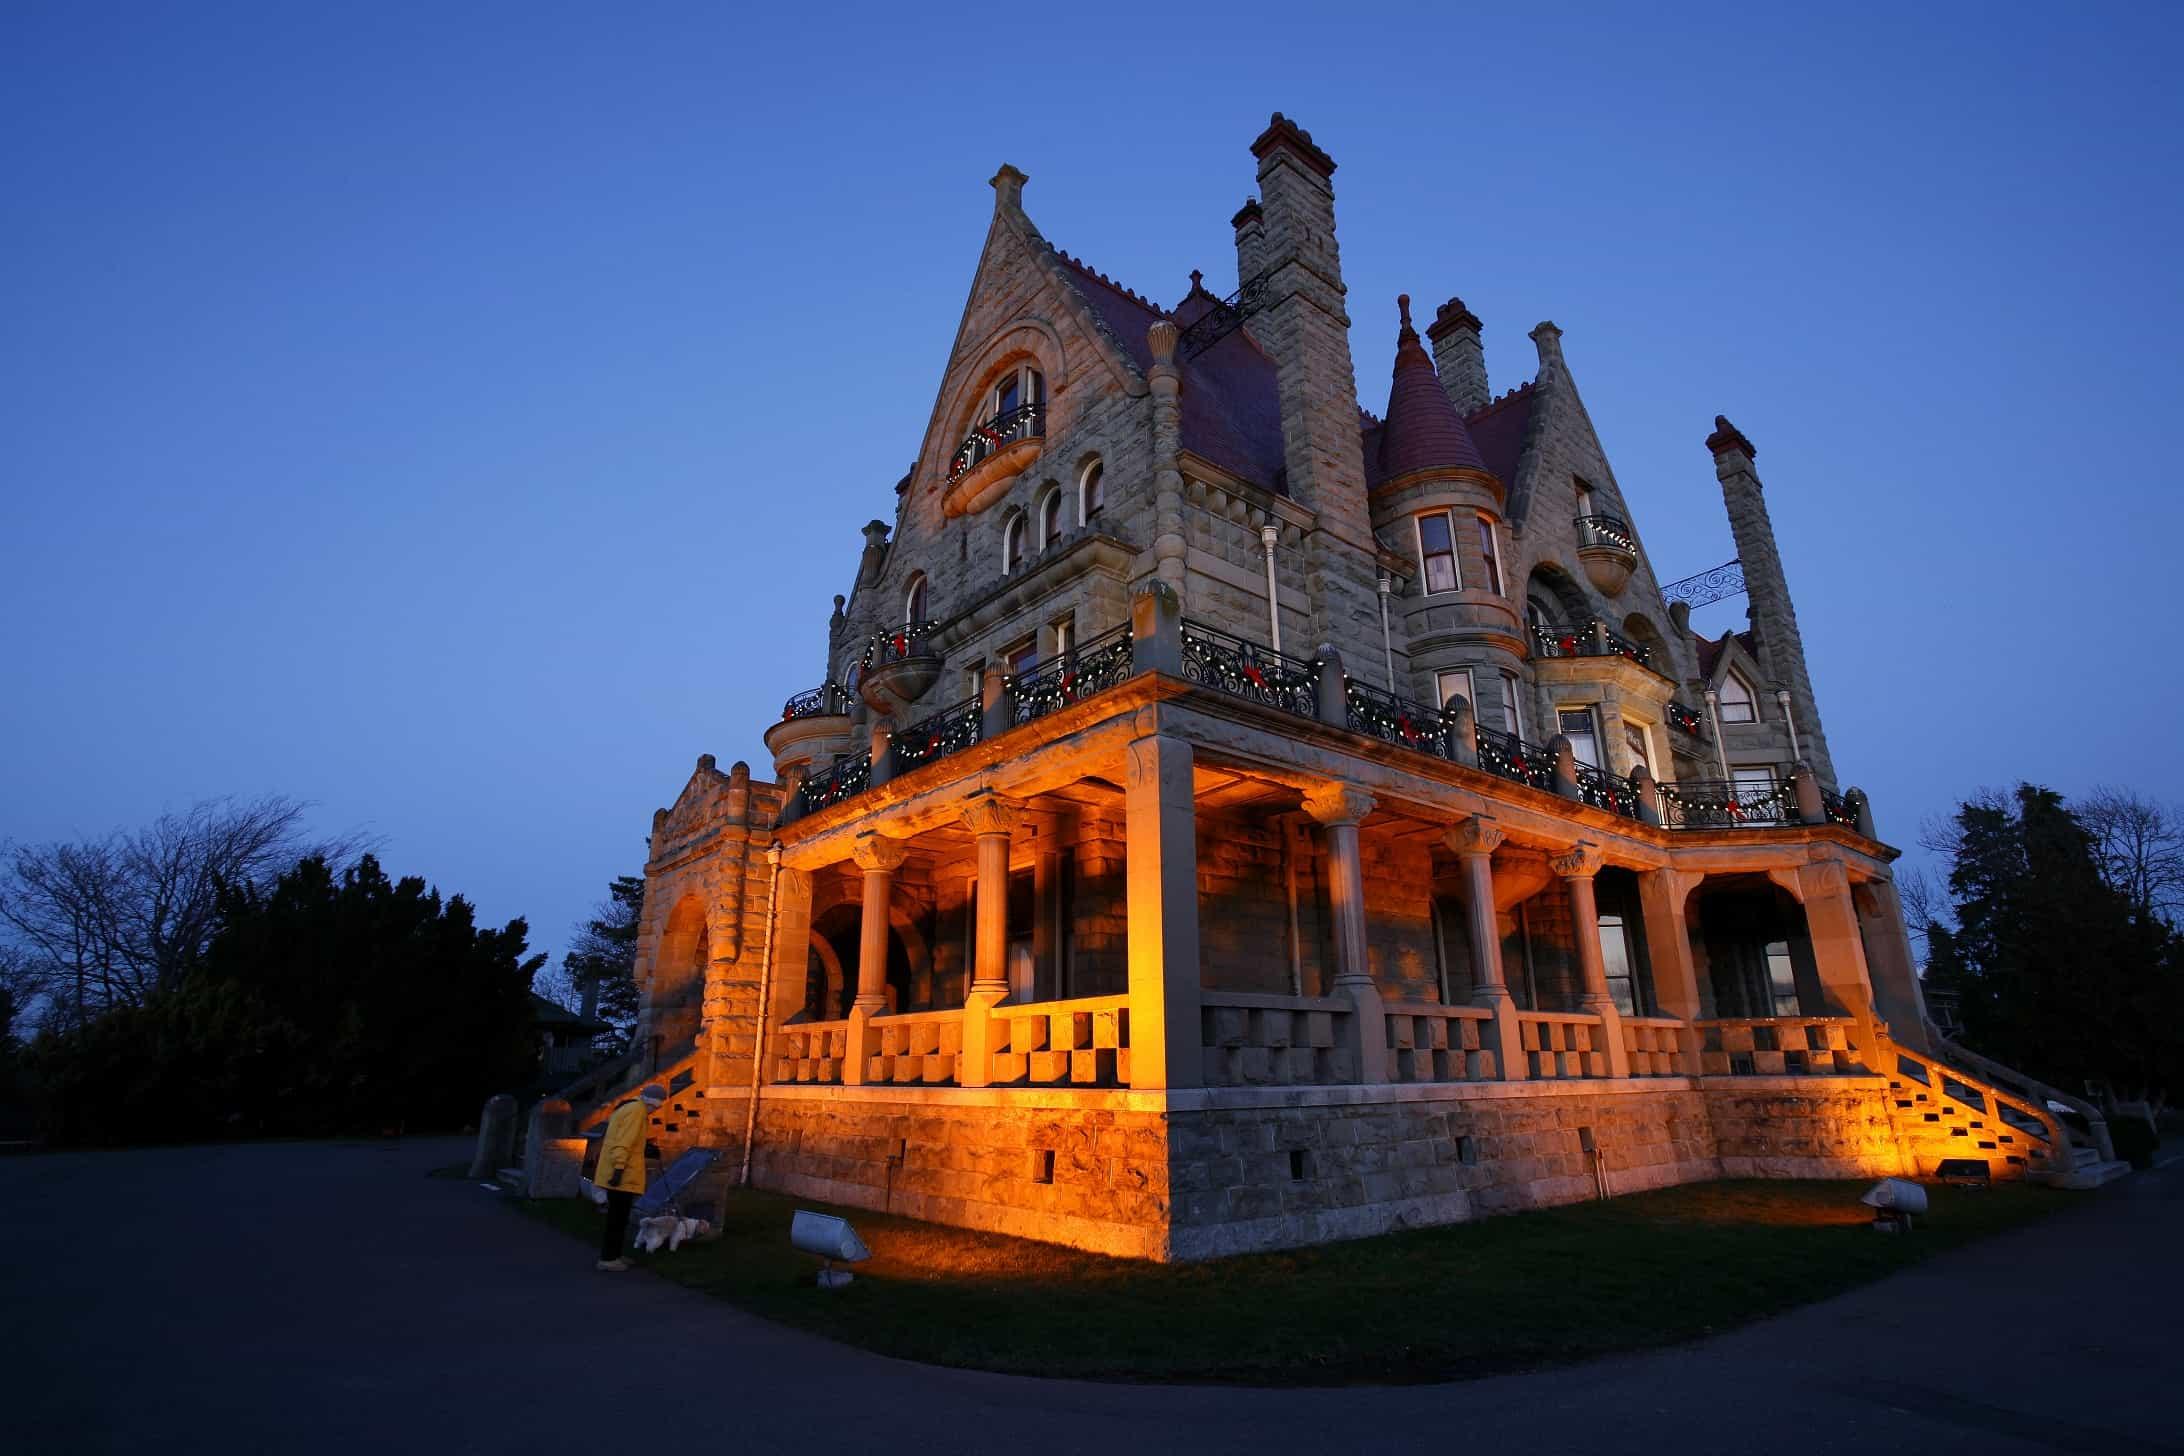 canada s castle the historic gem that is craigdarroch. Black Bedroom Furniture Sets. Home Design Ideas